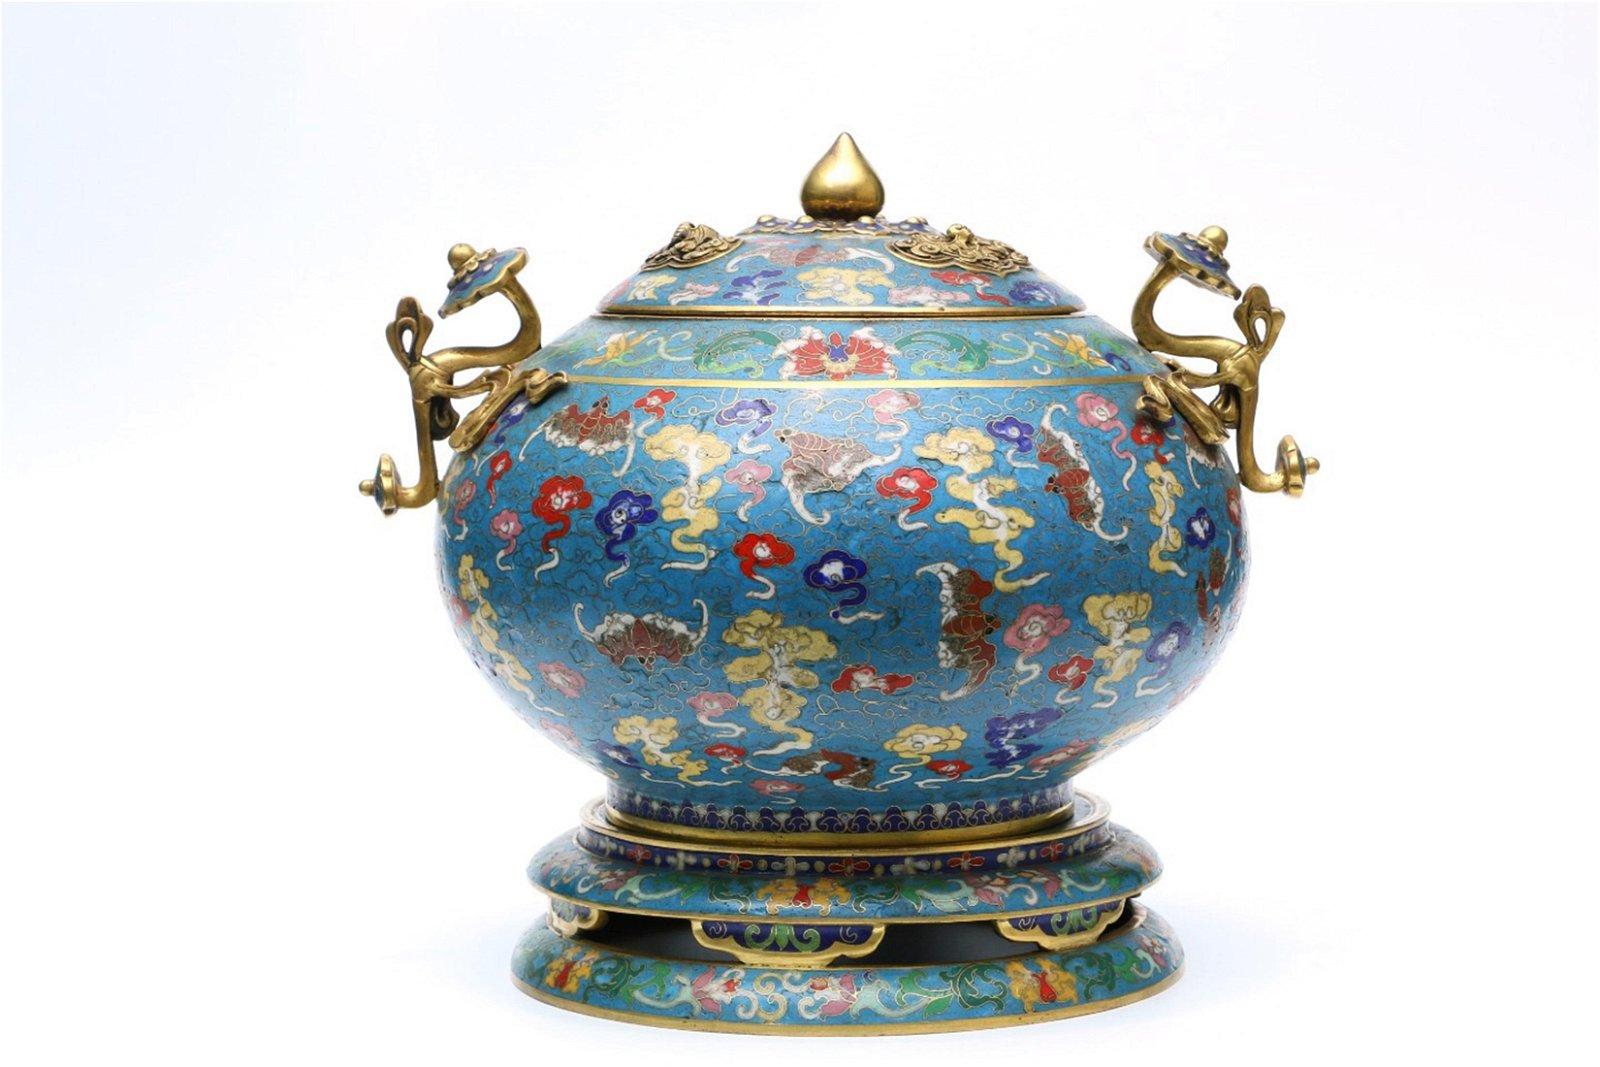 A Chinese Gilt Bronze Cloisonne Incense Burner